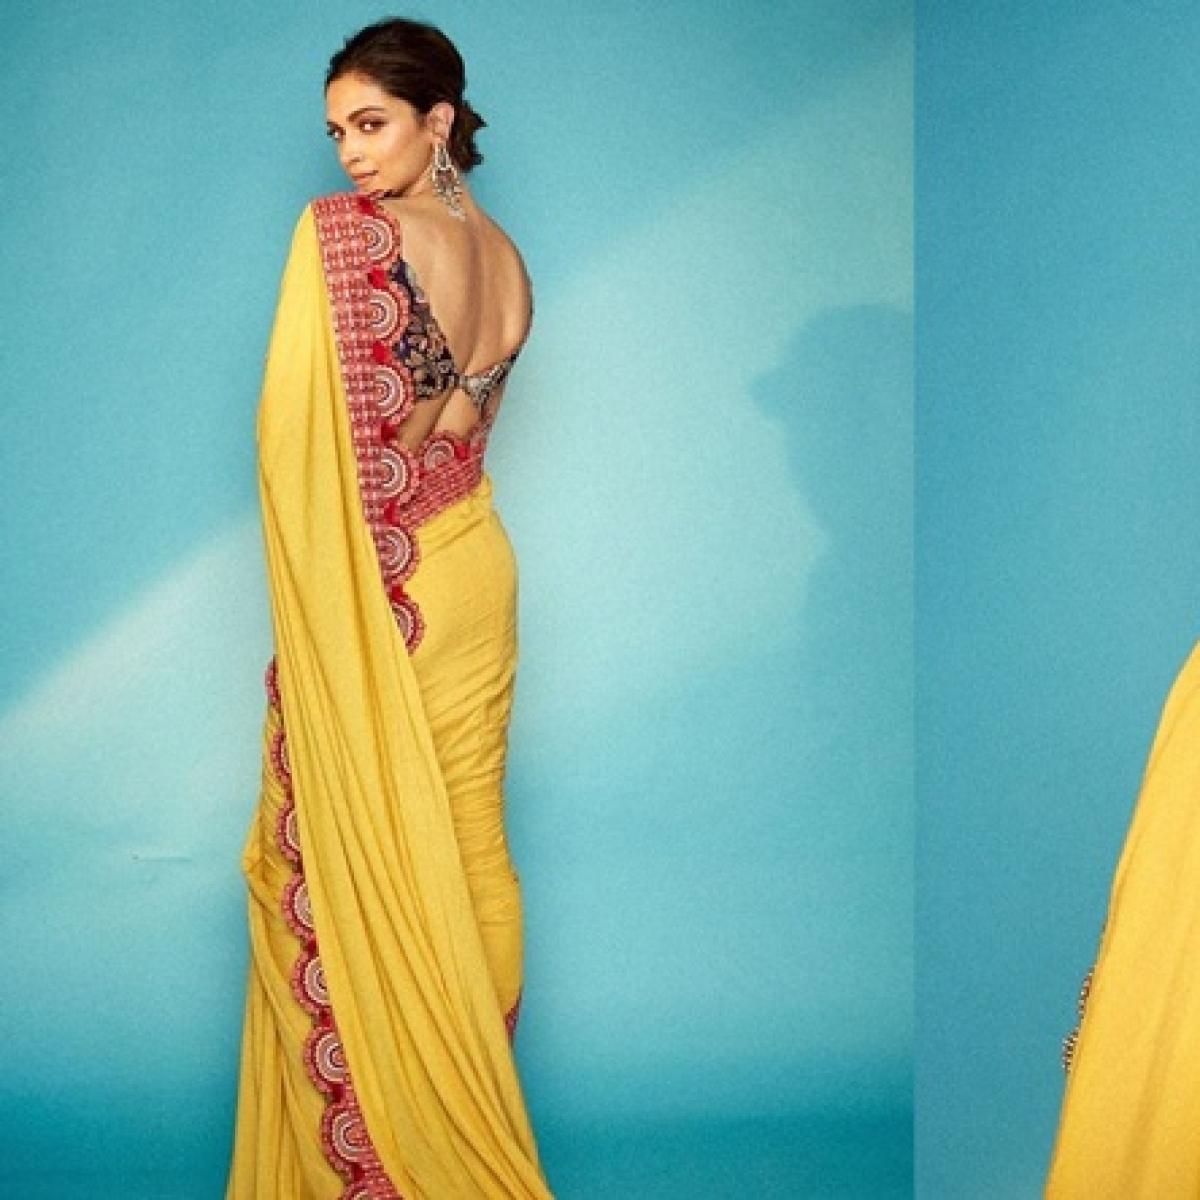 Saree not Sorry: Deepika Padukone turns into an ethnic goddess for 'Chhapaak' promotions